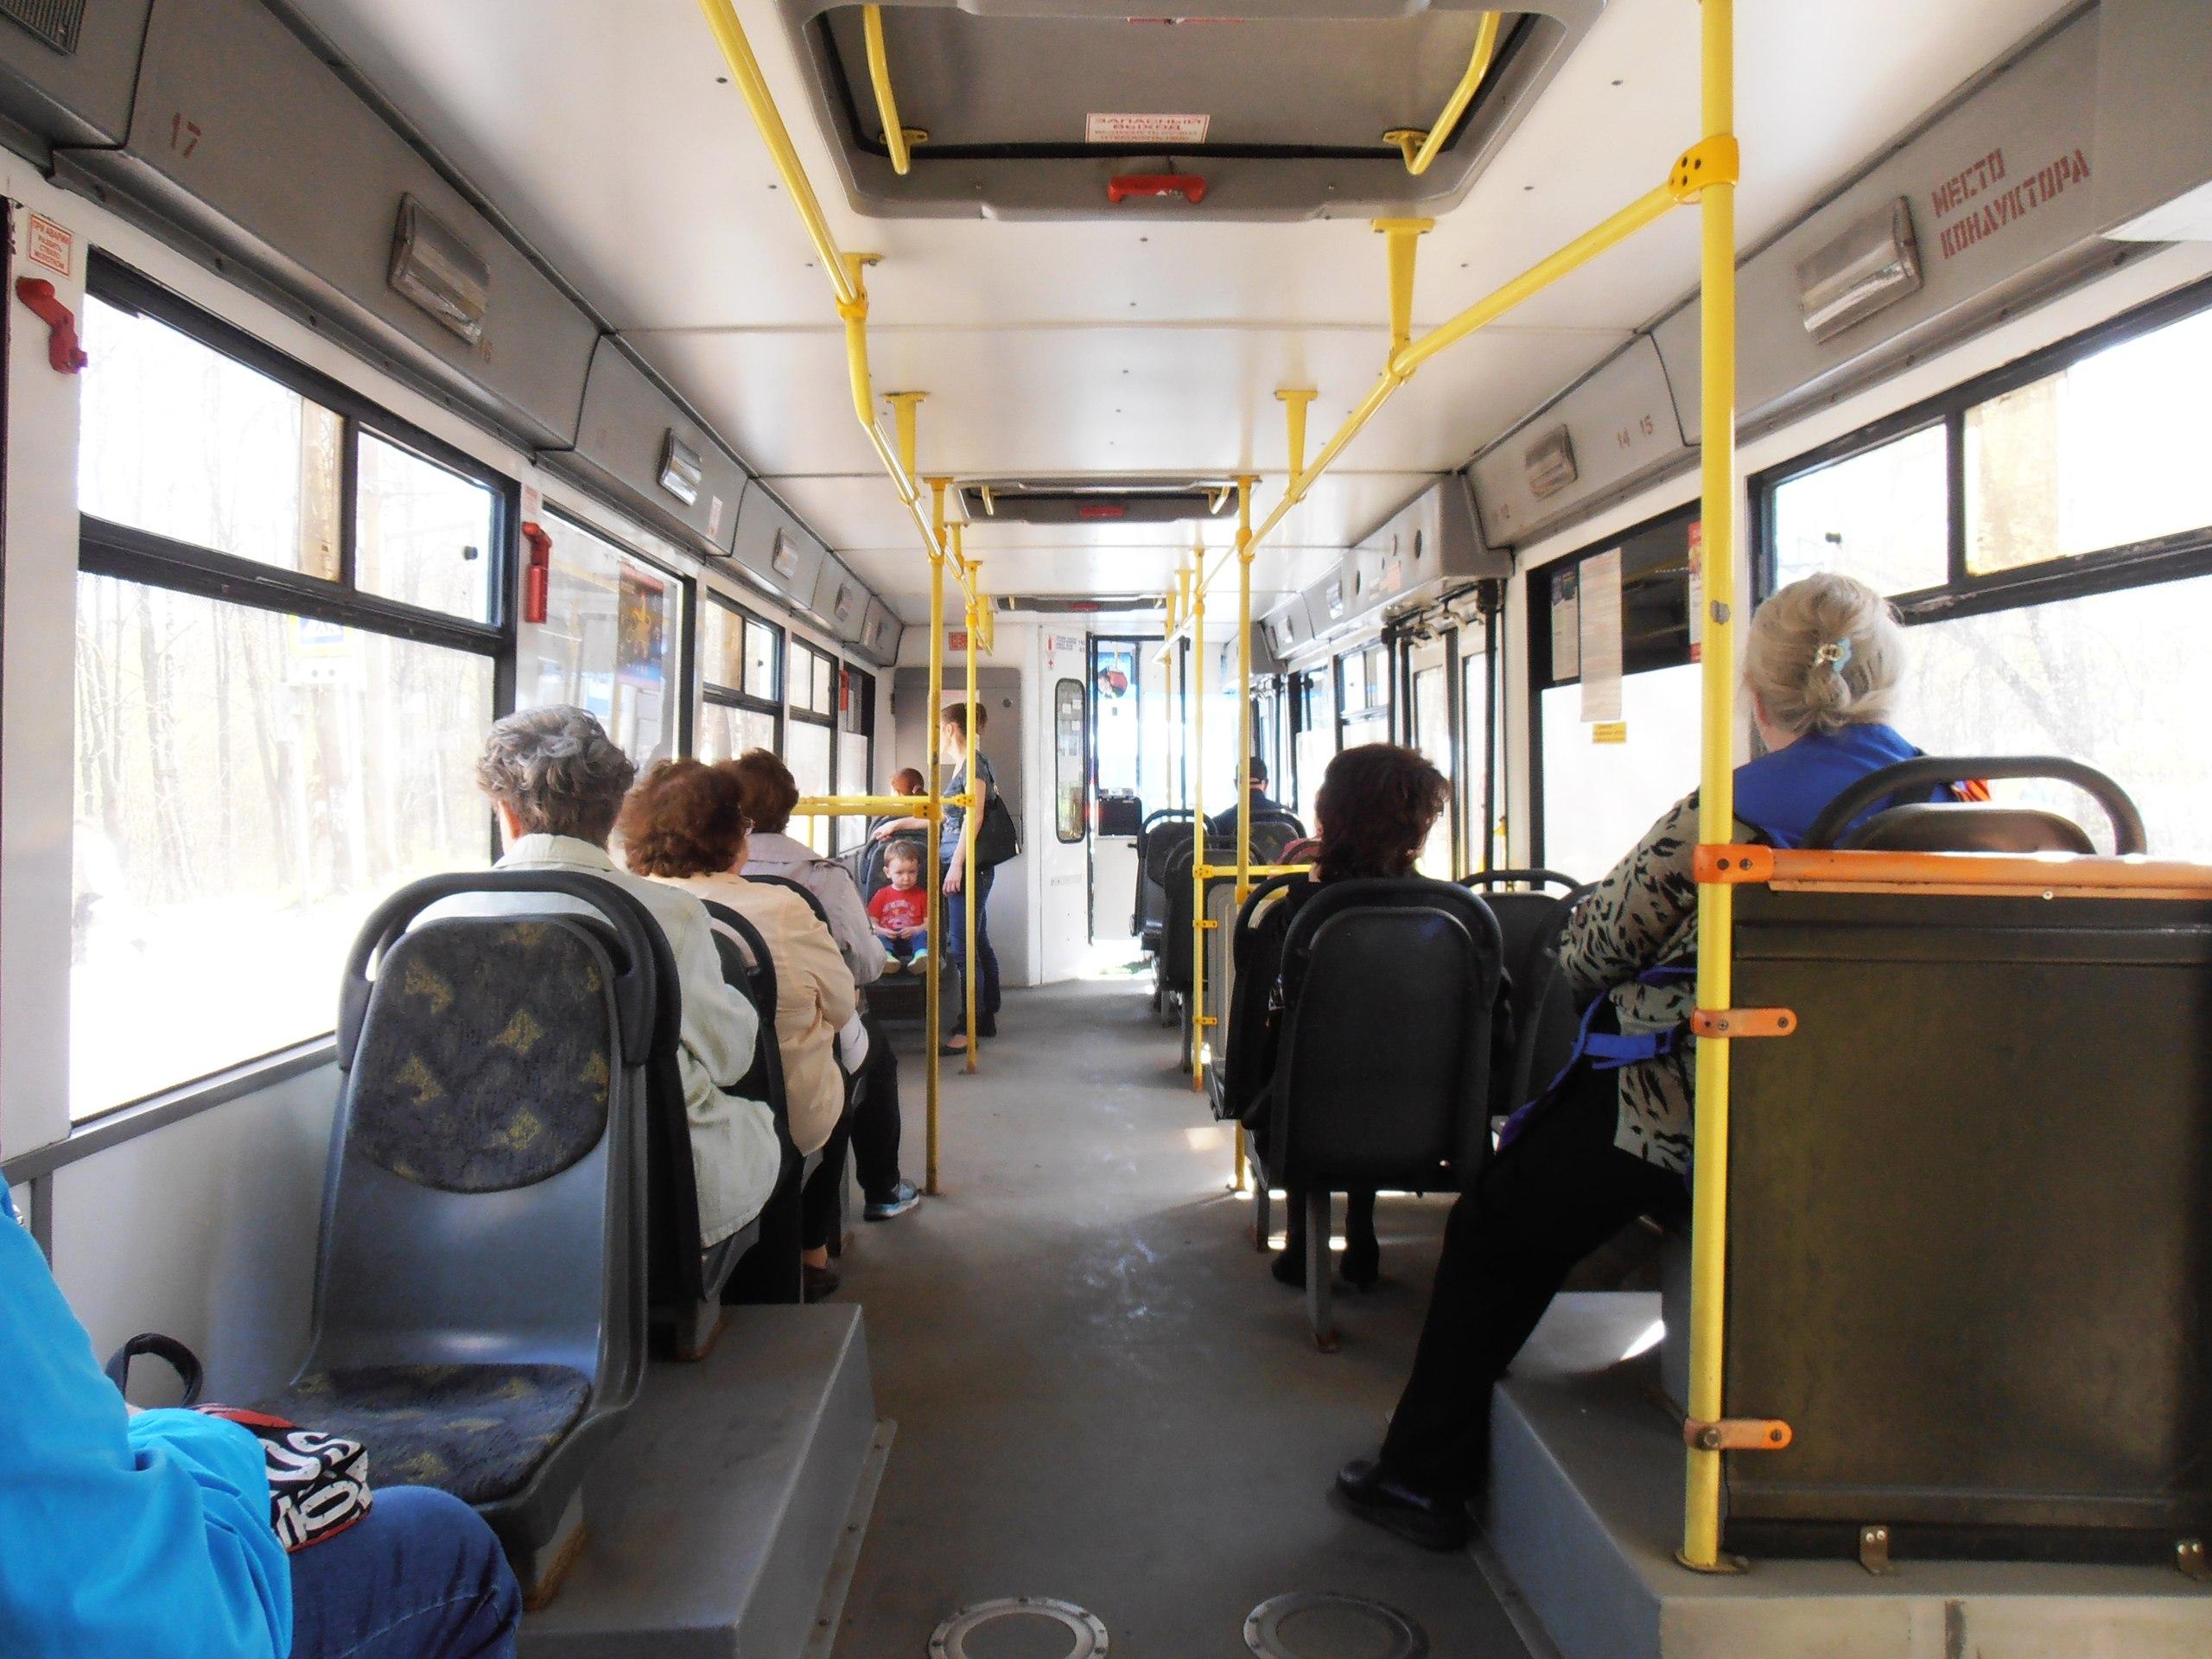 Автобус №23. Пассажиры